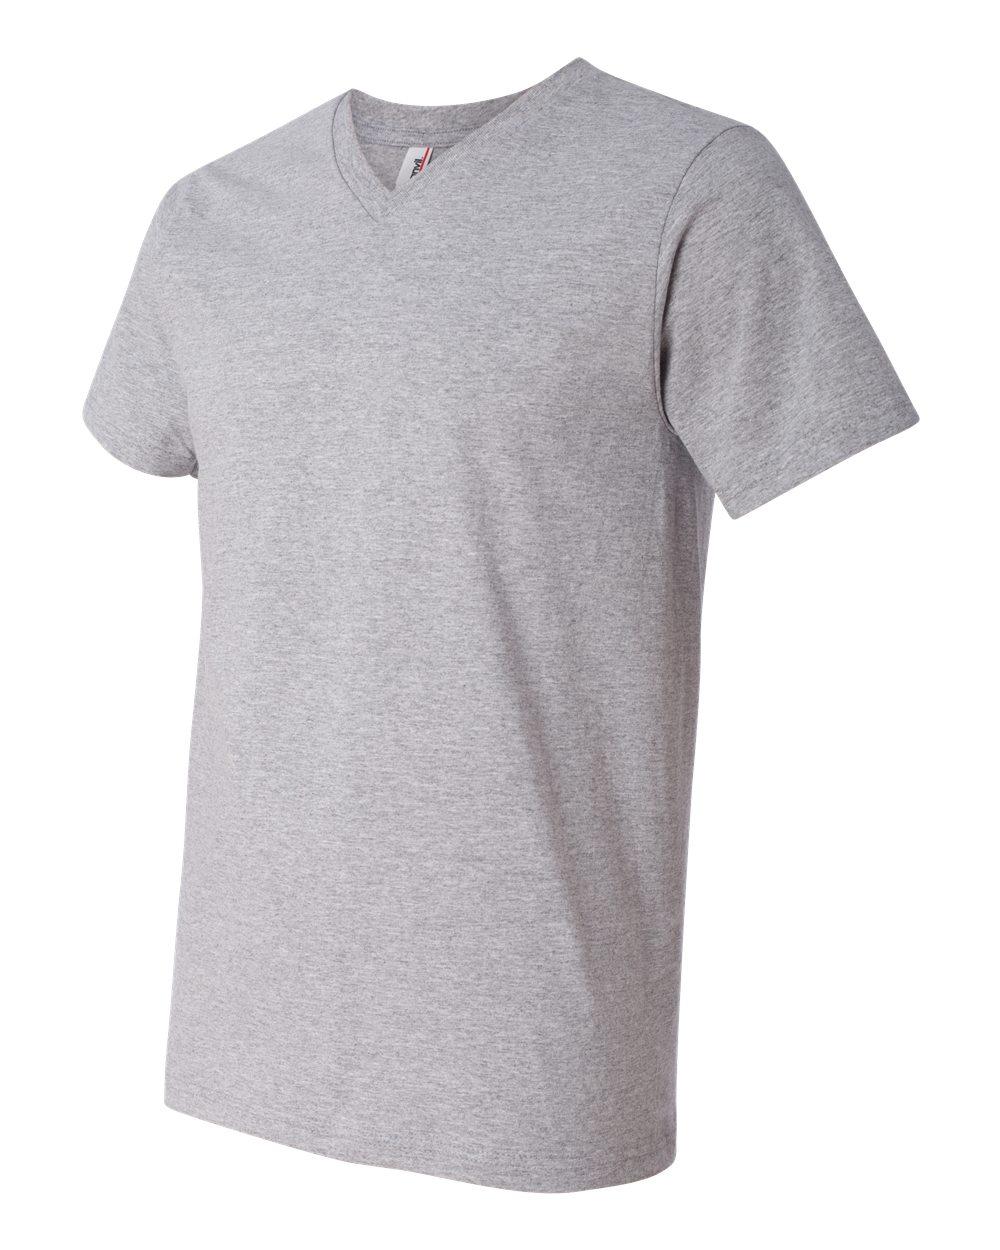 Anvil-Men-039-s-Lightweight-V-Neck-T-Shirt-982-S-3XL thumbnail 15